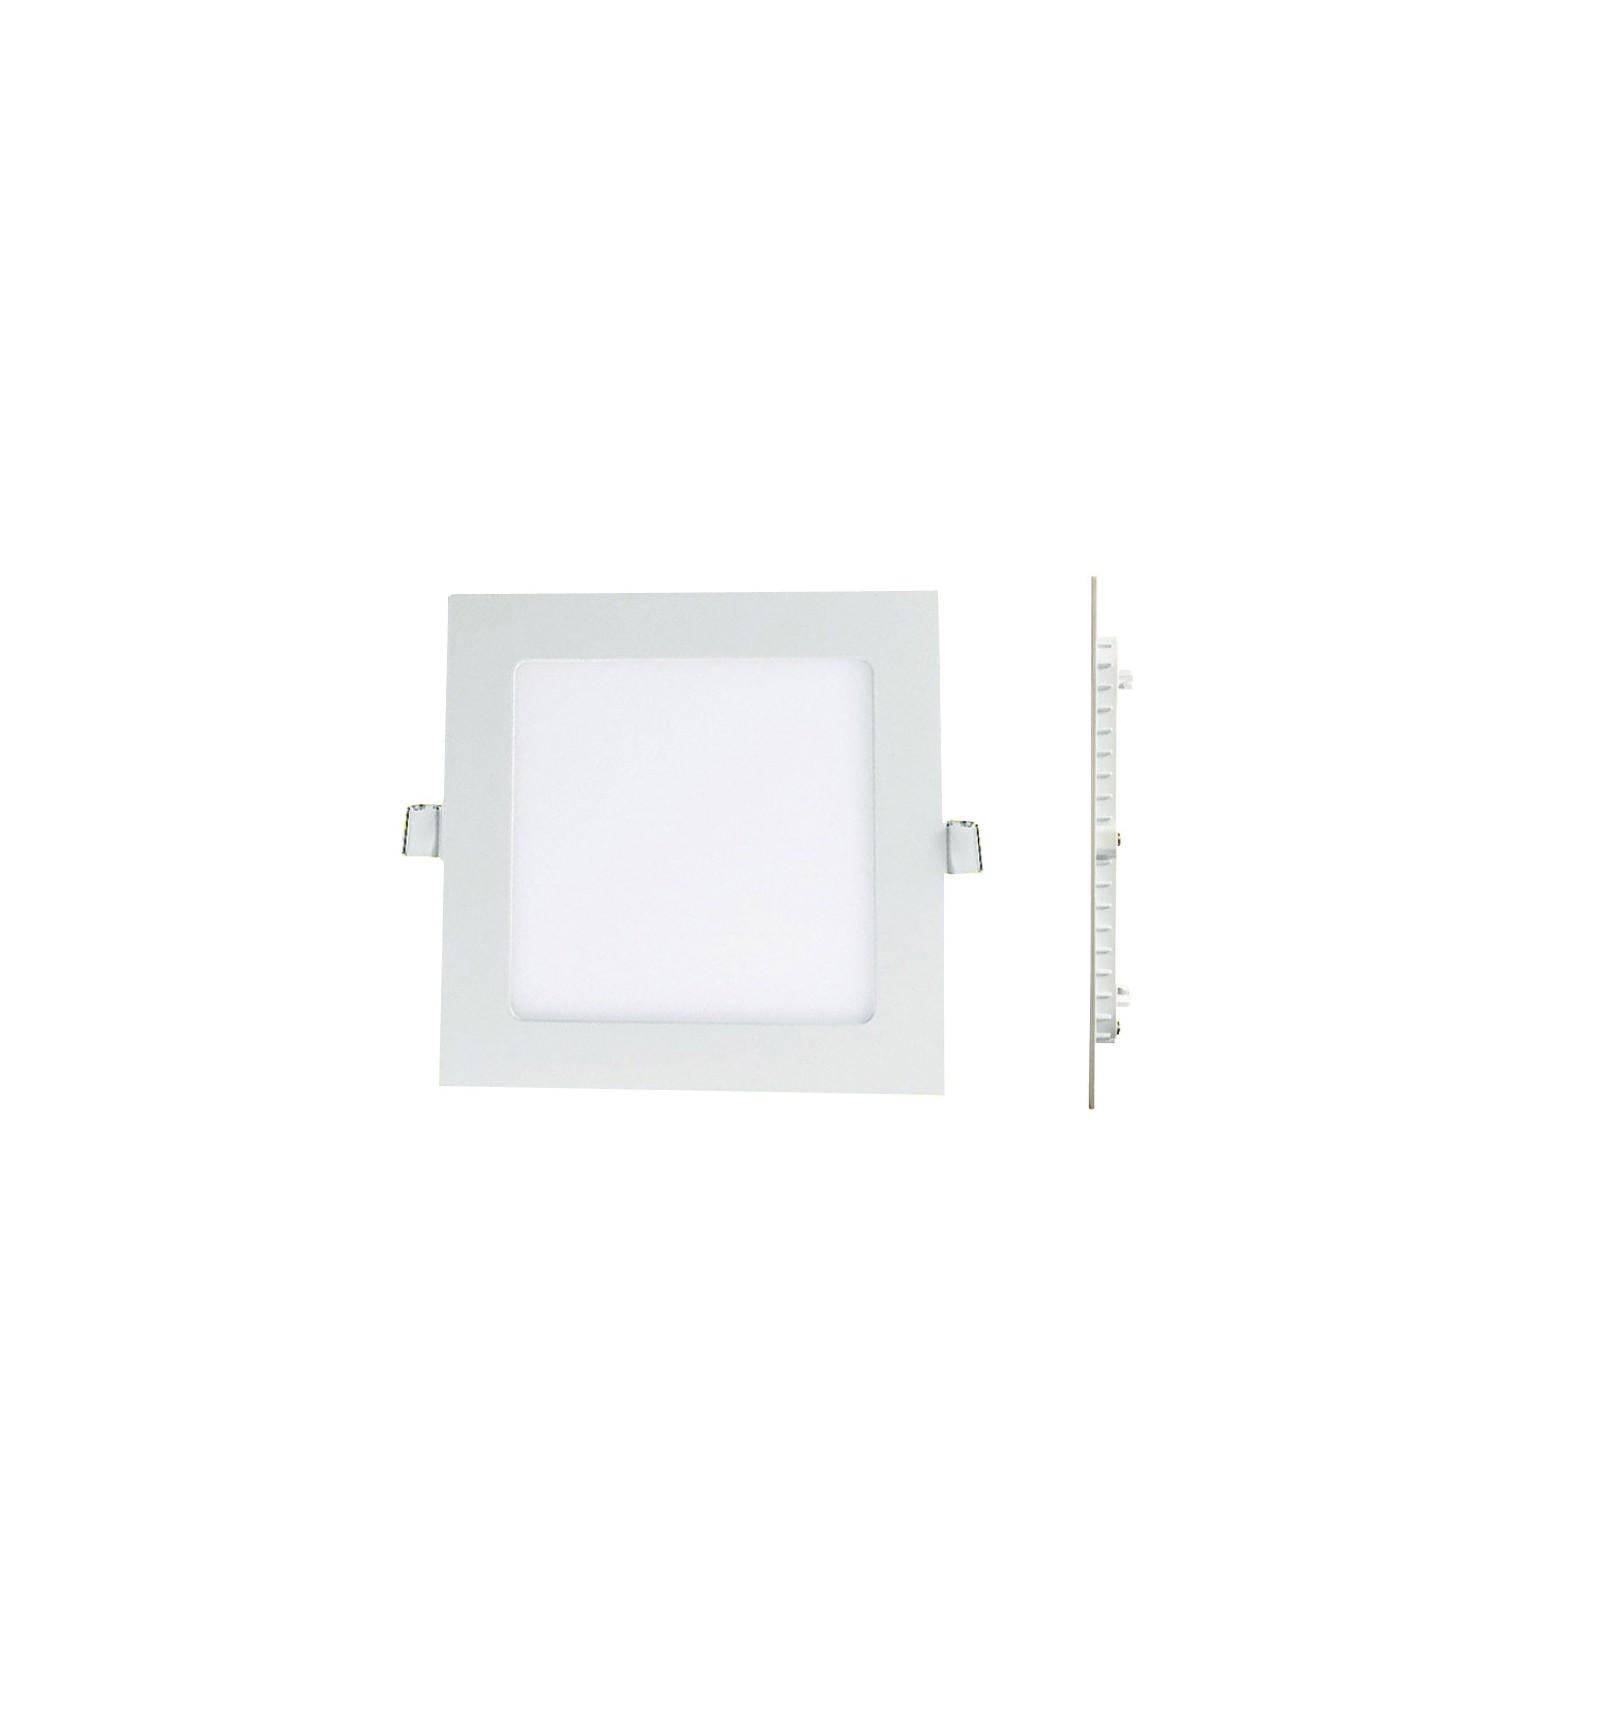 spot encastrable led carre downlight panel extra plat 3w blanc froid 6000k. Black Bedroom Furniture Sets. Home Design Ideas